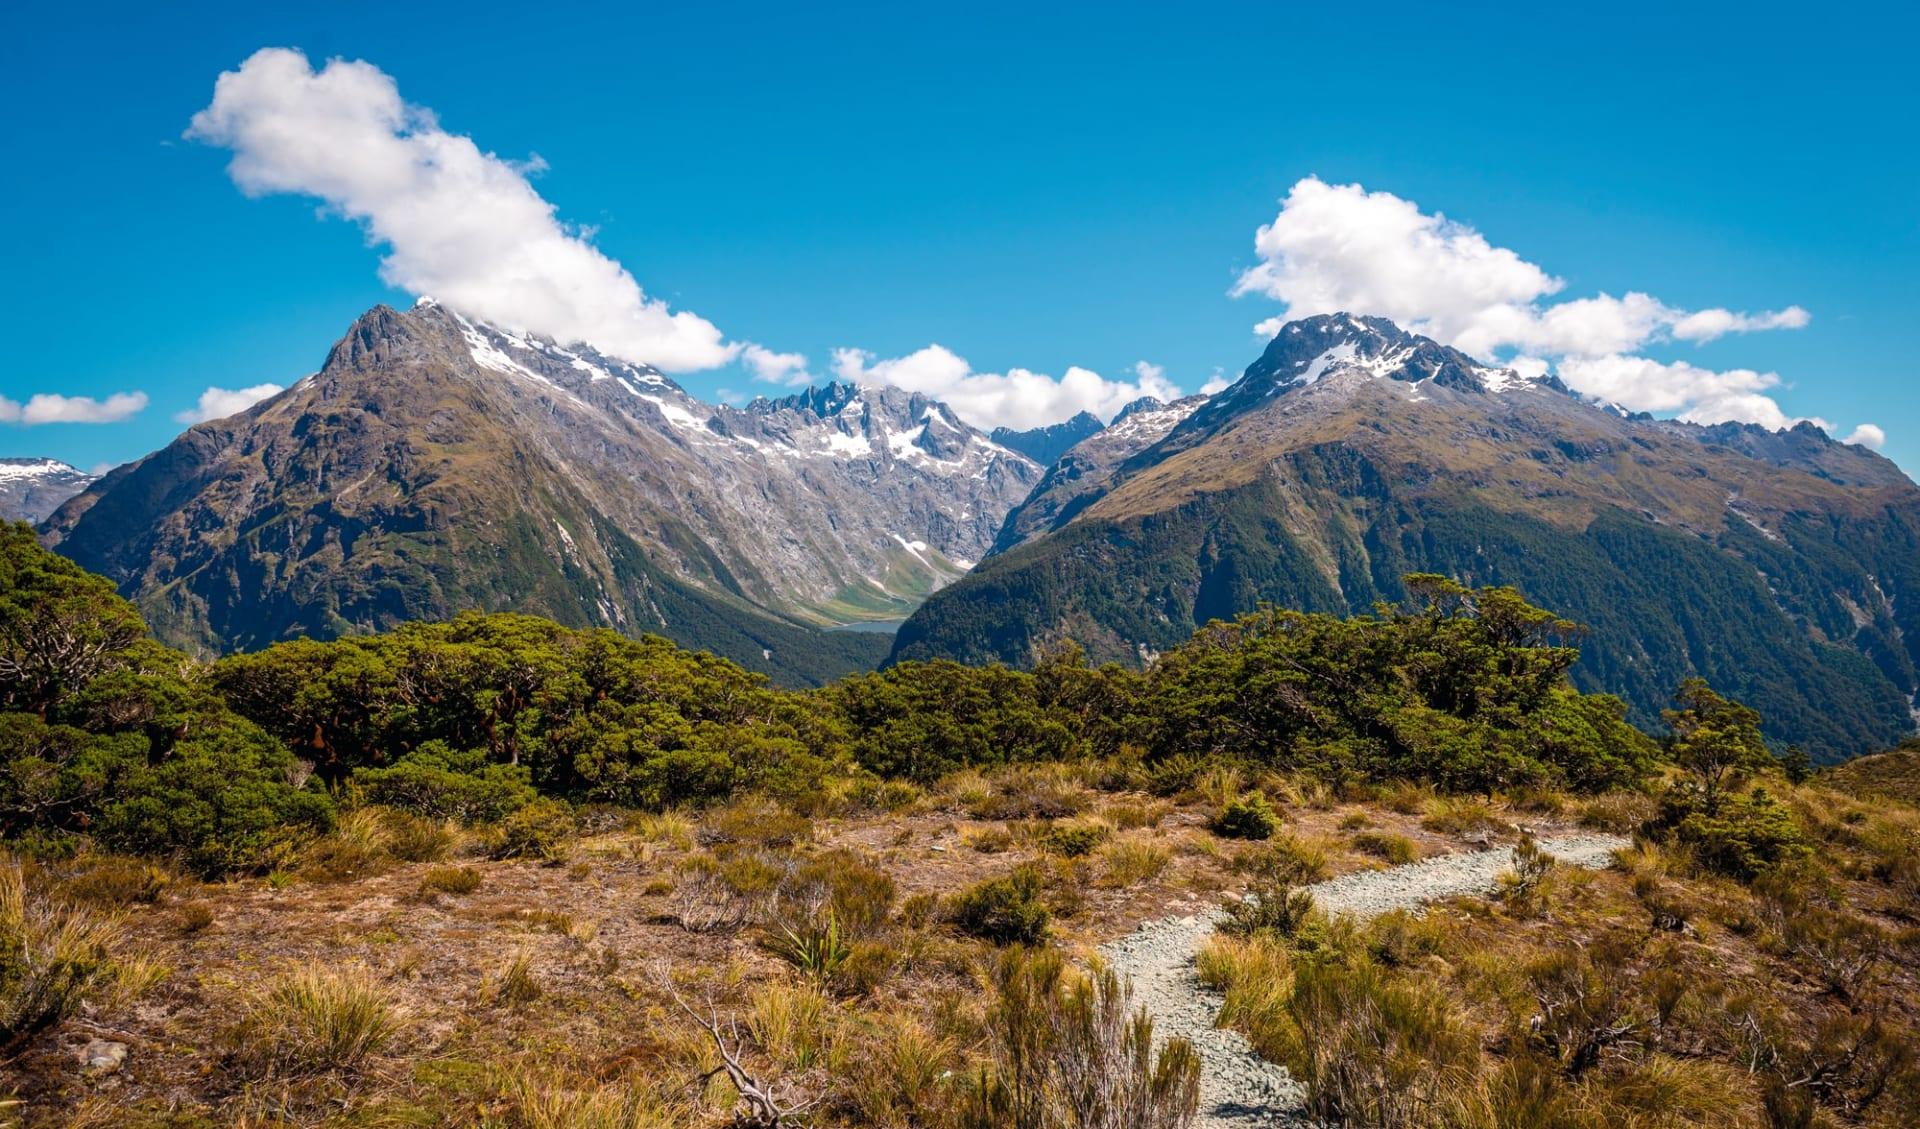 Routeburn Track ab Queenstown: Neuseeland - Key Summit Milford - South Island